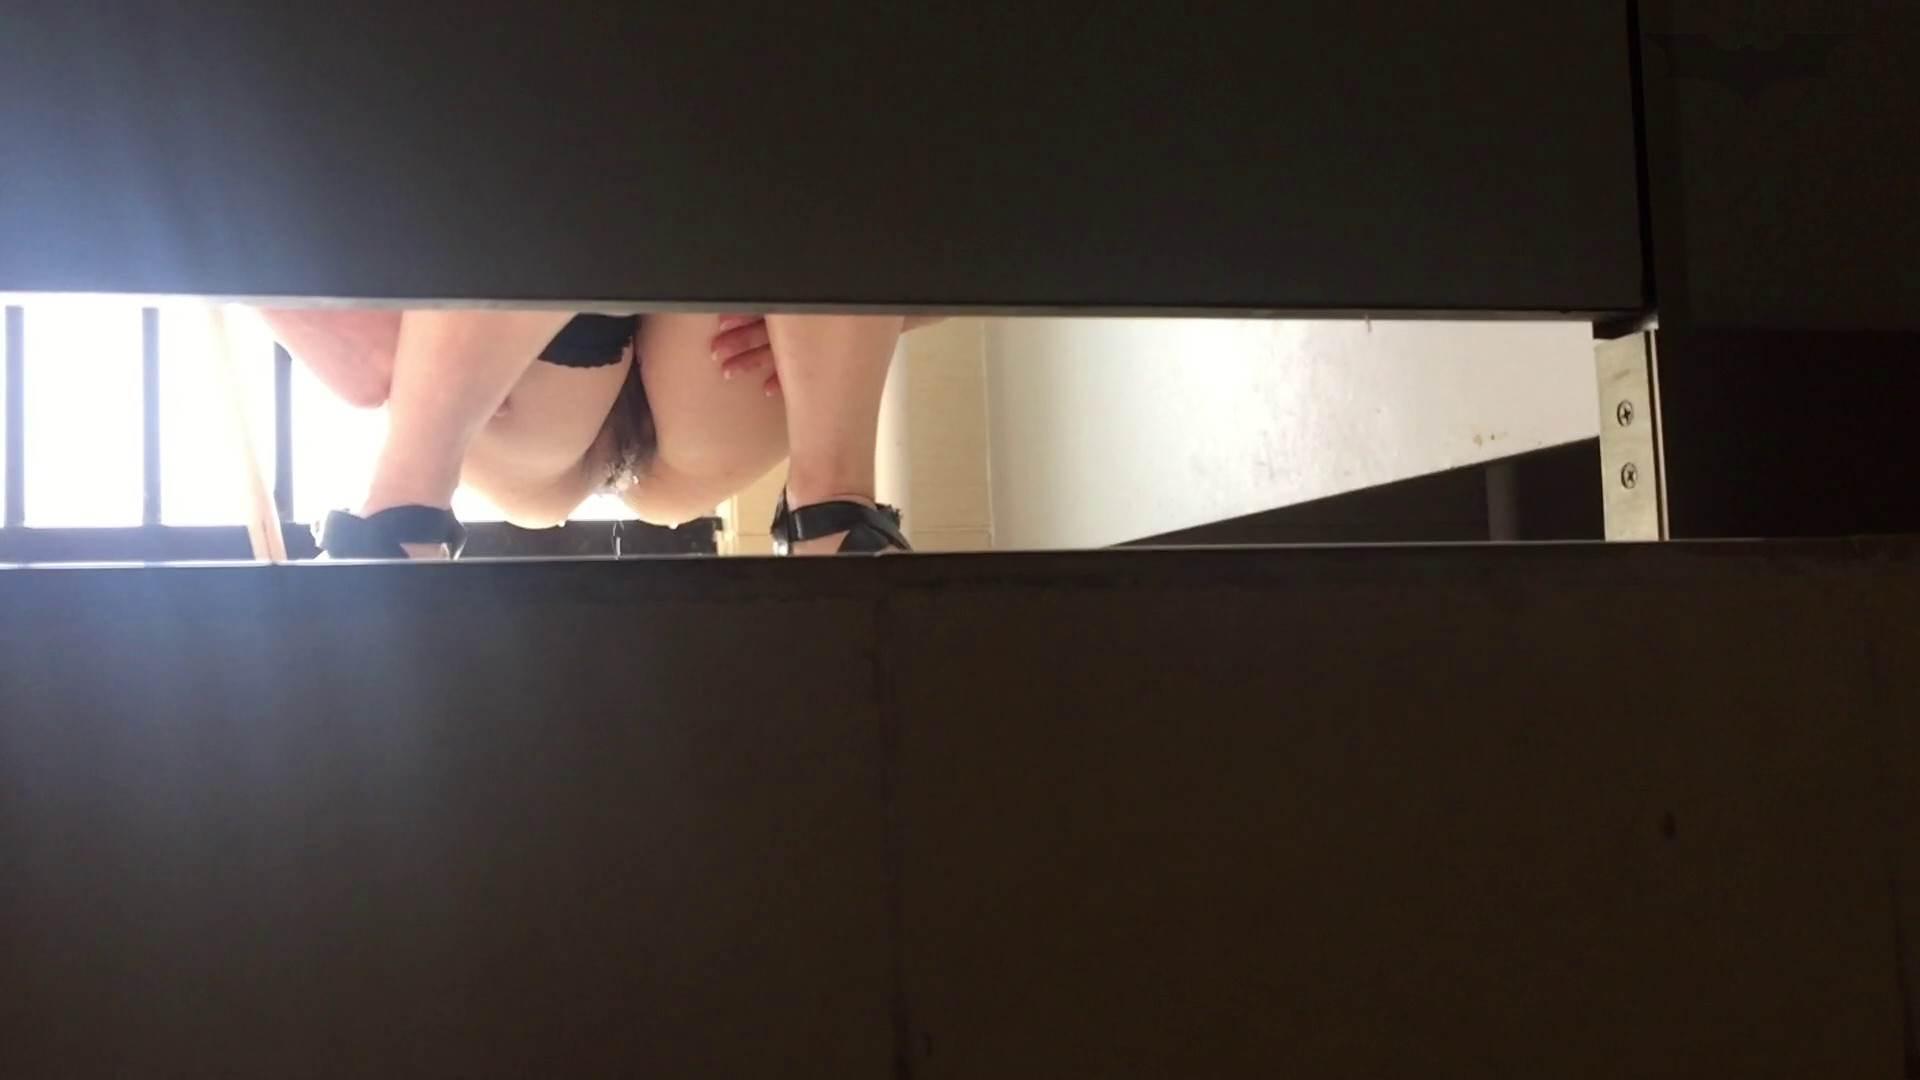 JD盗撮 美女の洗面所の秘密 Vol.73 美女 おまんこ無修正動画無料 75枚 34